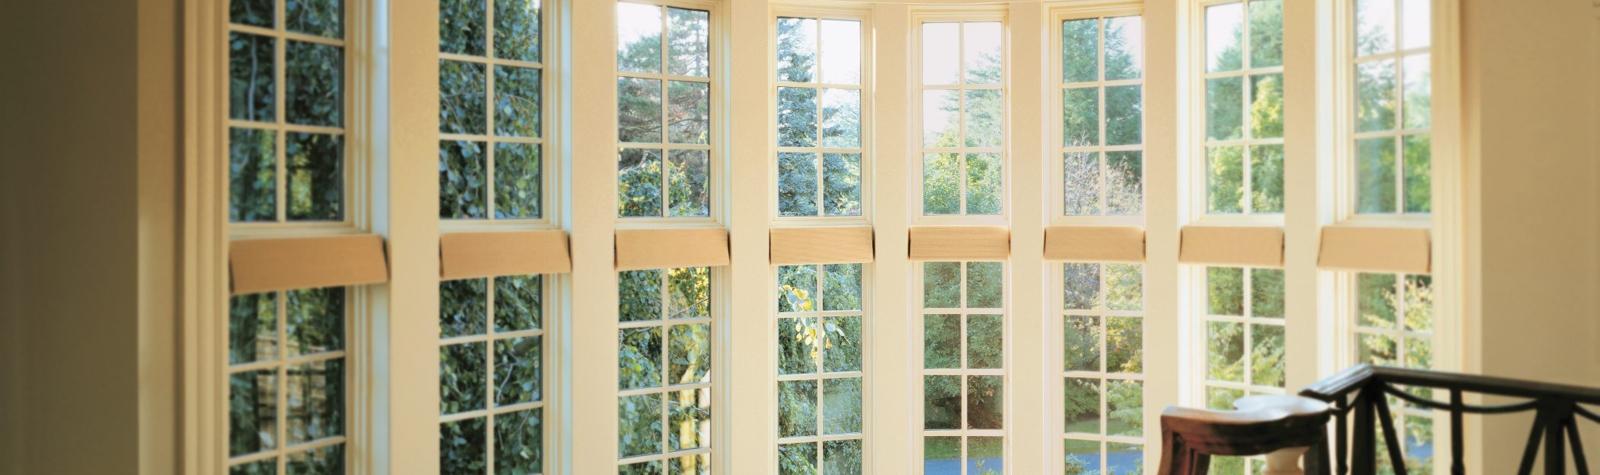 Double Hung Windows Columbus Ohio : Double hung windows buschurs home improvement center